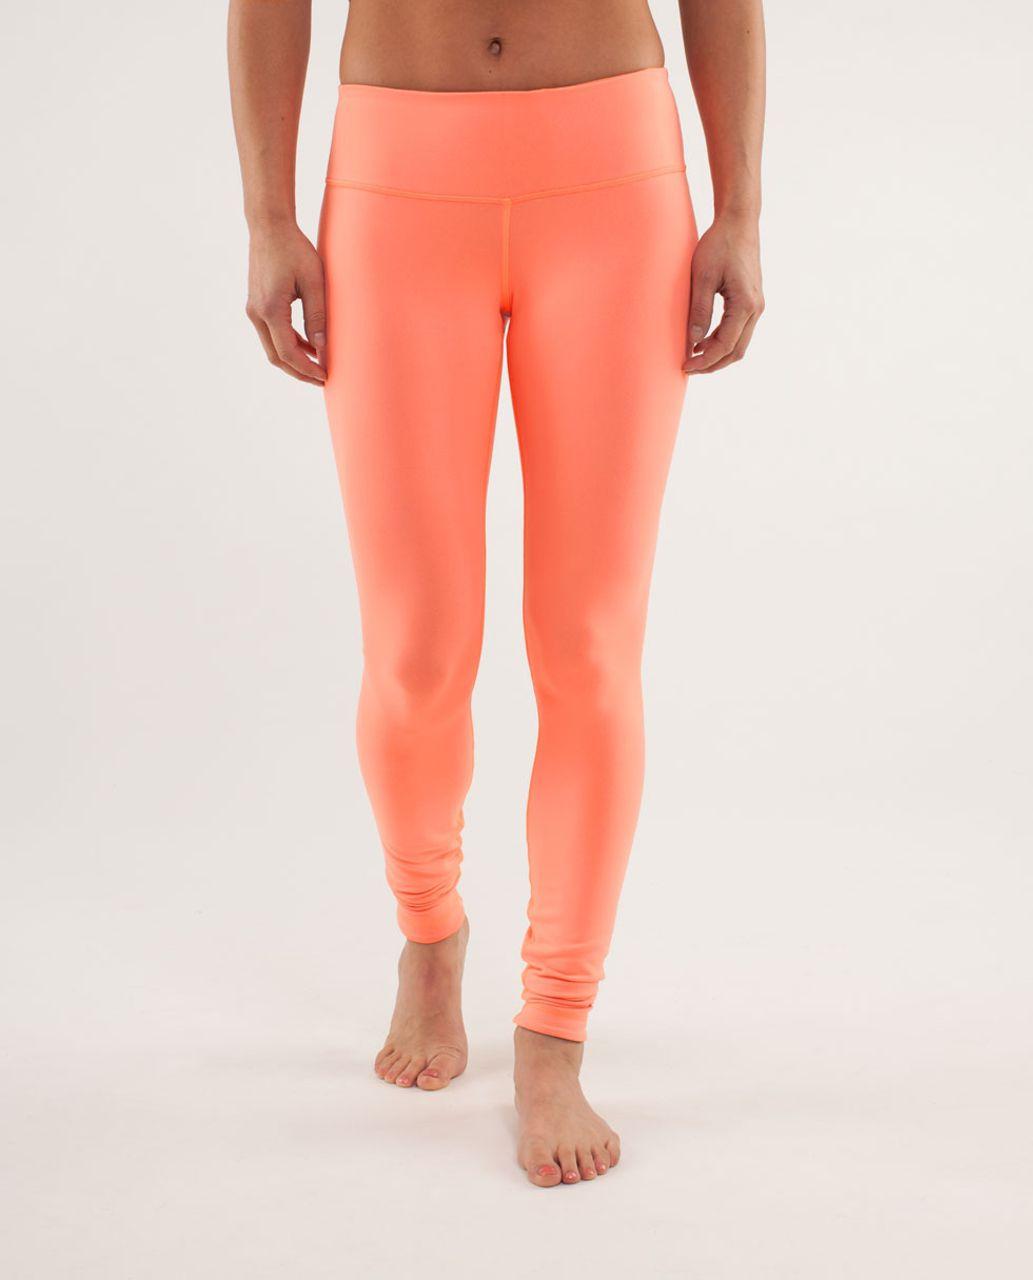 Lululemon Wunder Under Pant *Reversible - Black / Pop Orange